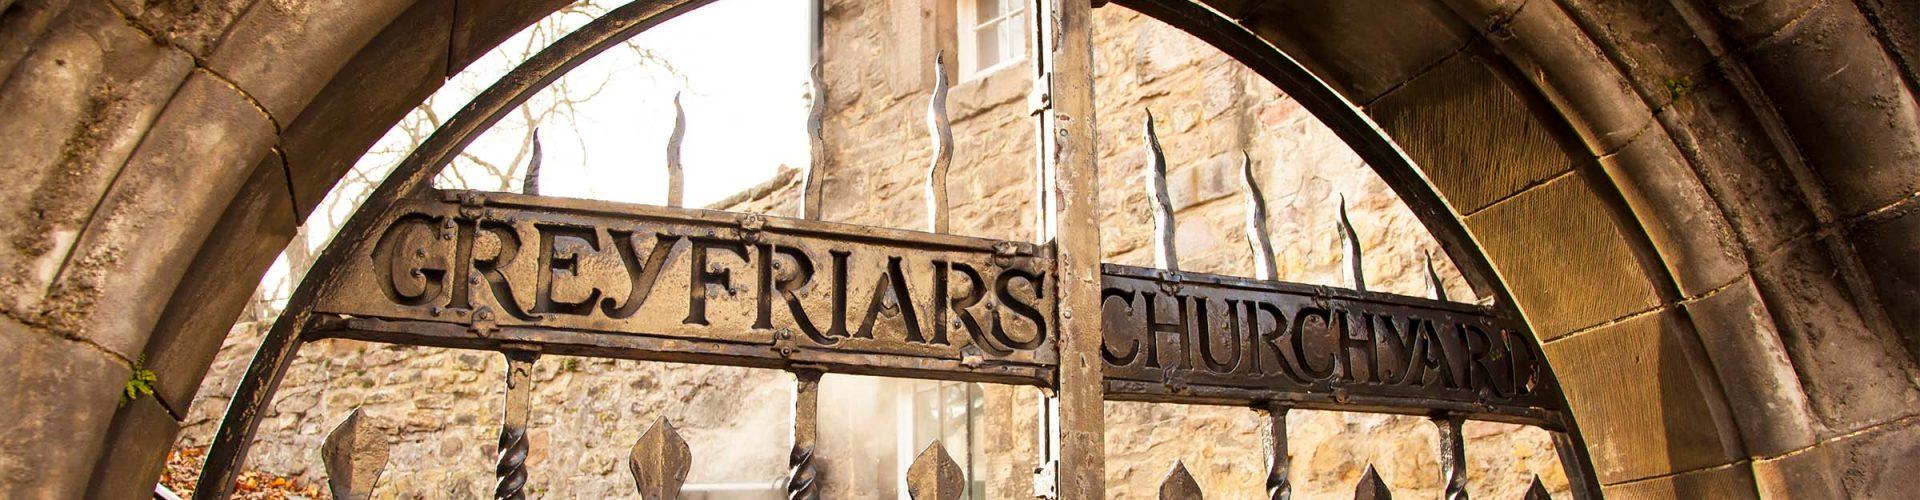 The gates to the churchyard at Greyfriars Kirk